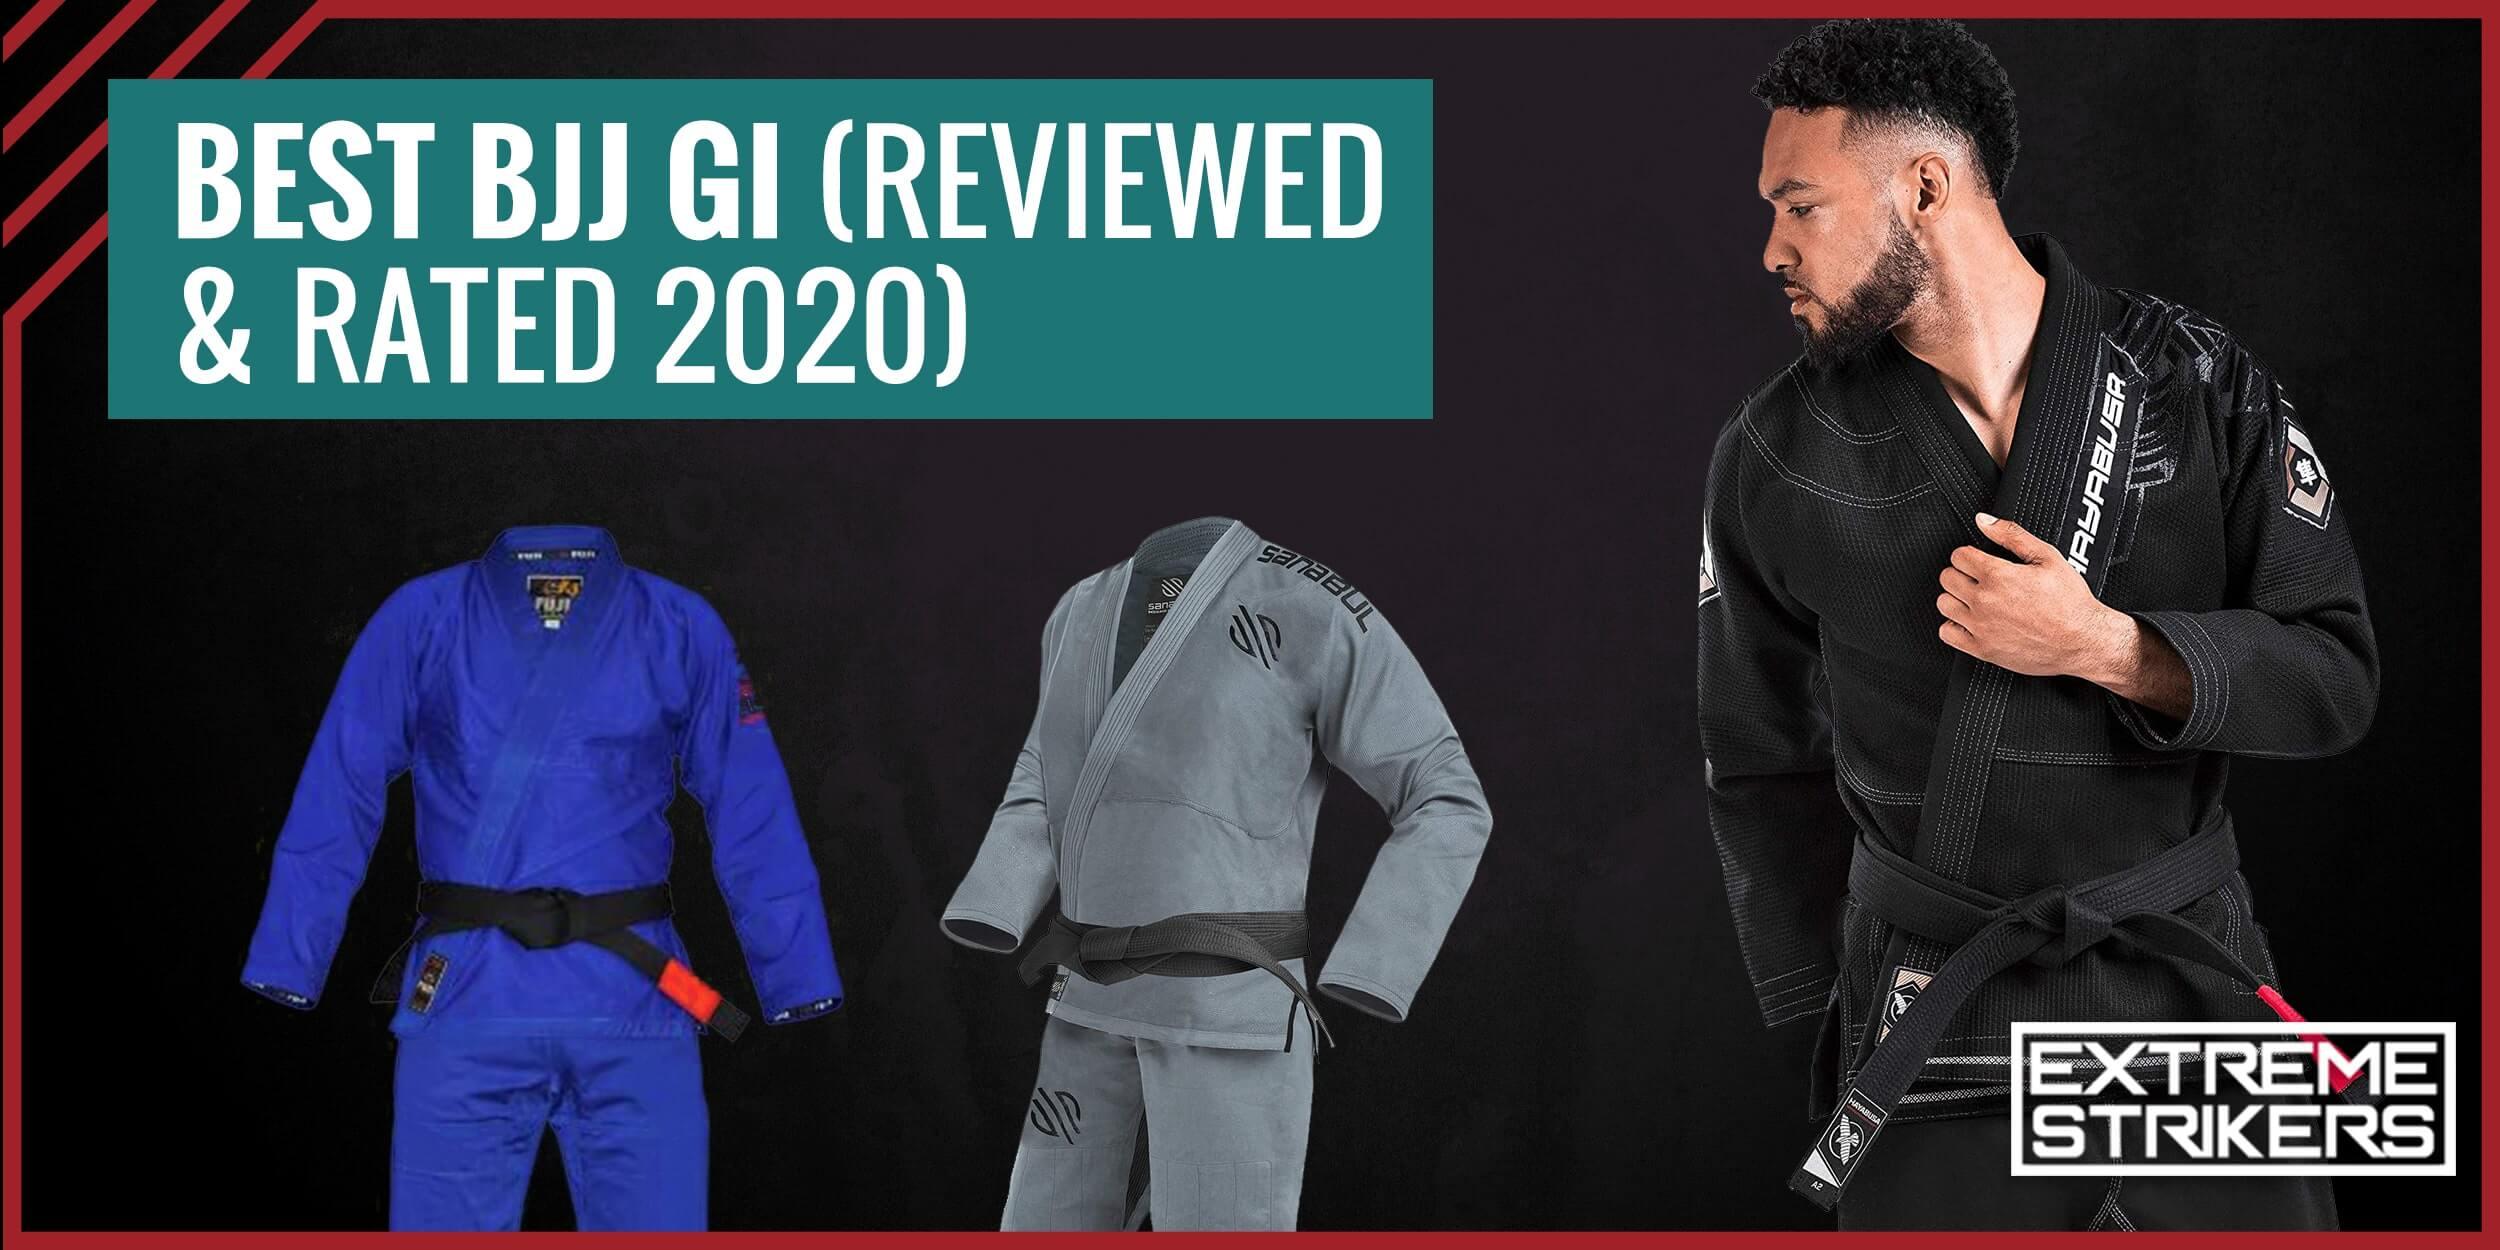 Best Bjj Gi (Reviews & Rating 2021)